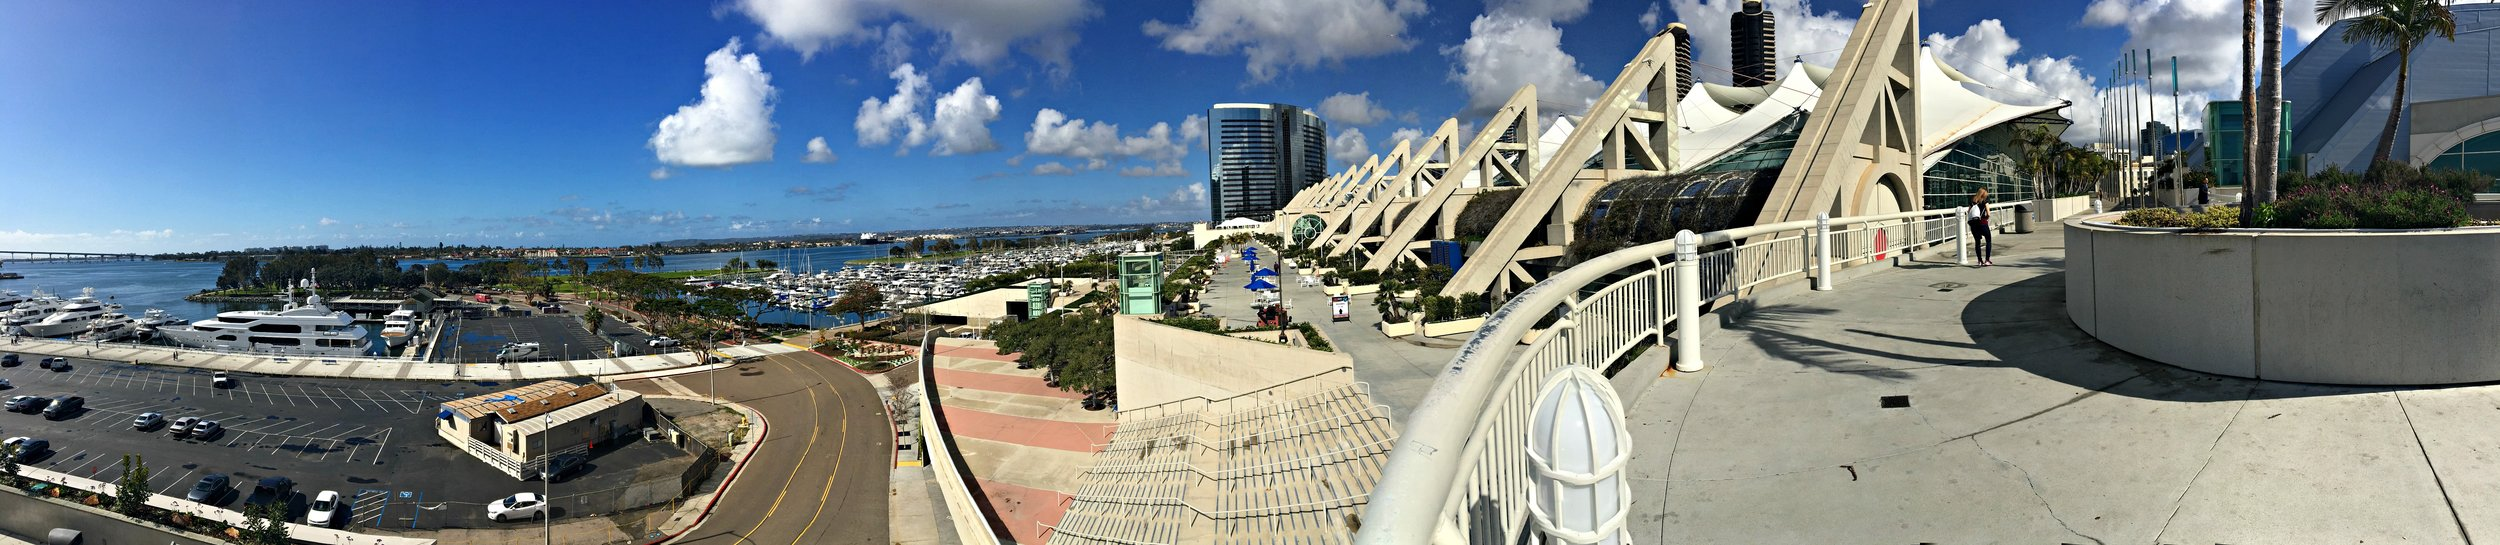 San Diego Convention Center in San Diego, California